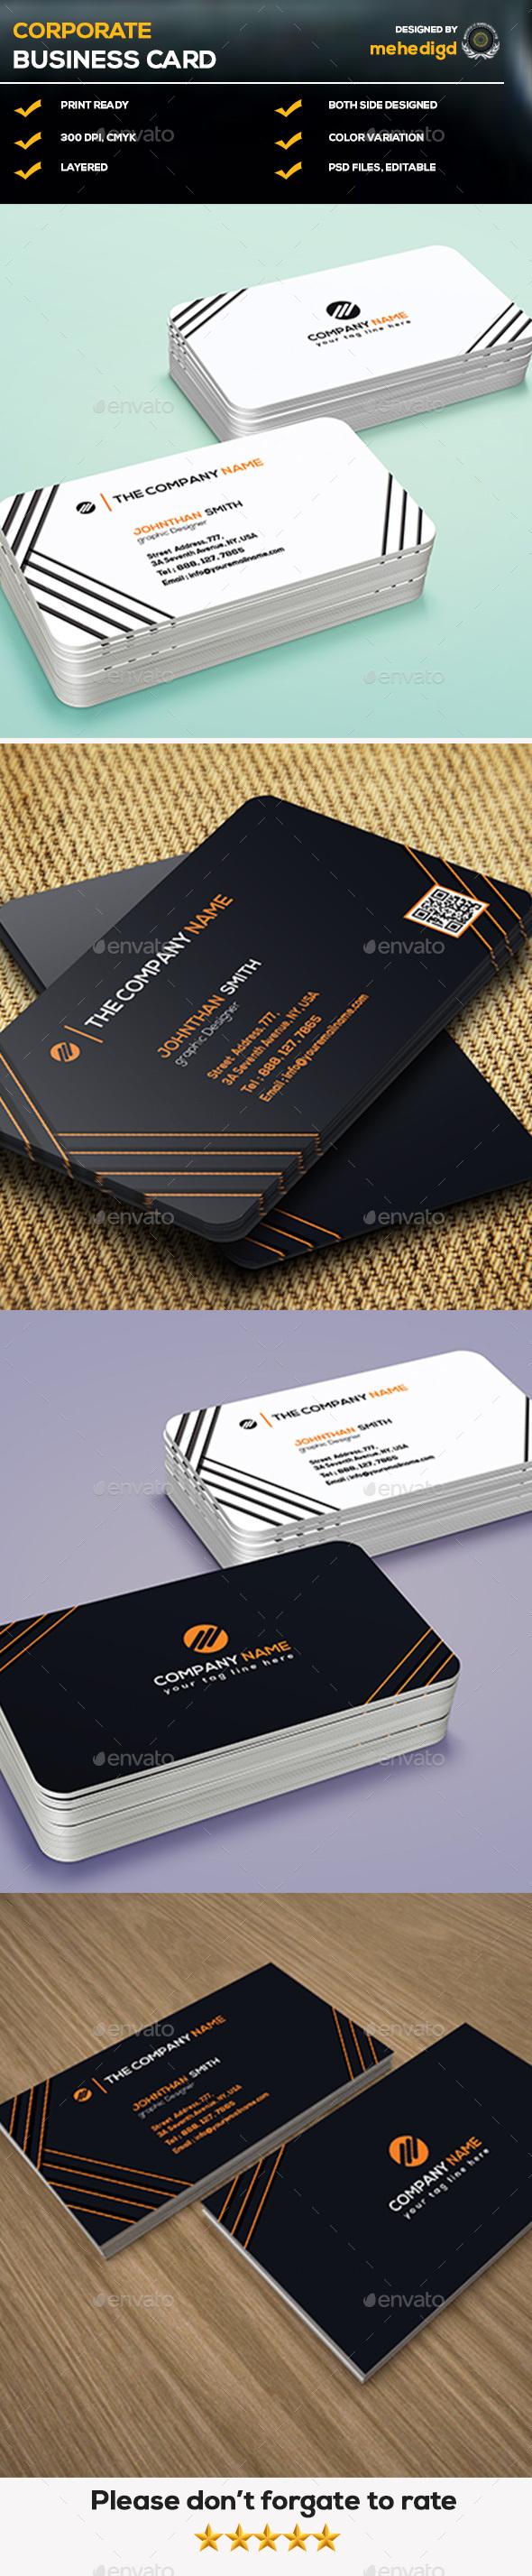 Corporate Business Card 8b Corporate Business Card Corporate Business Cards